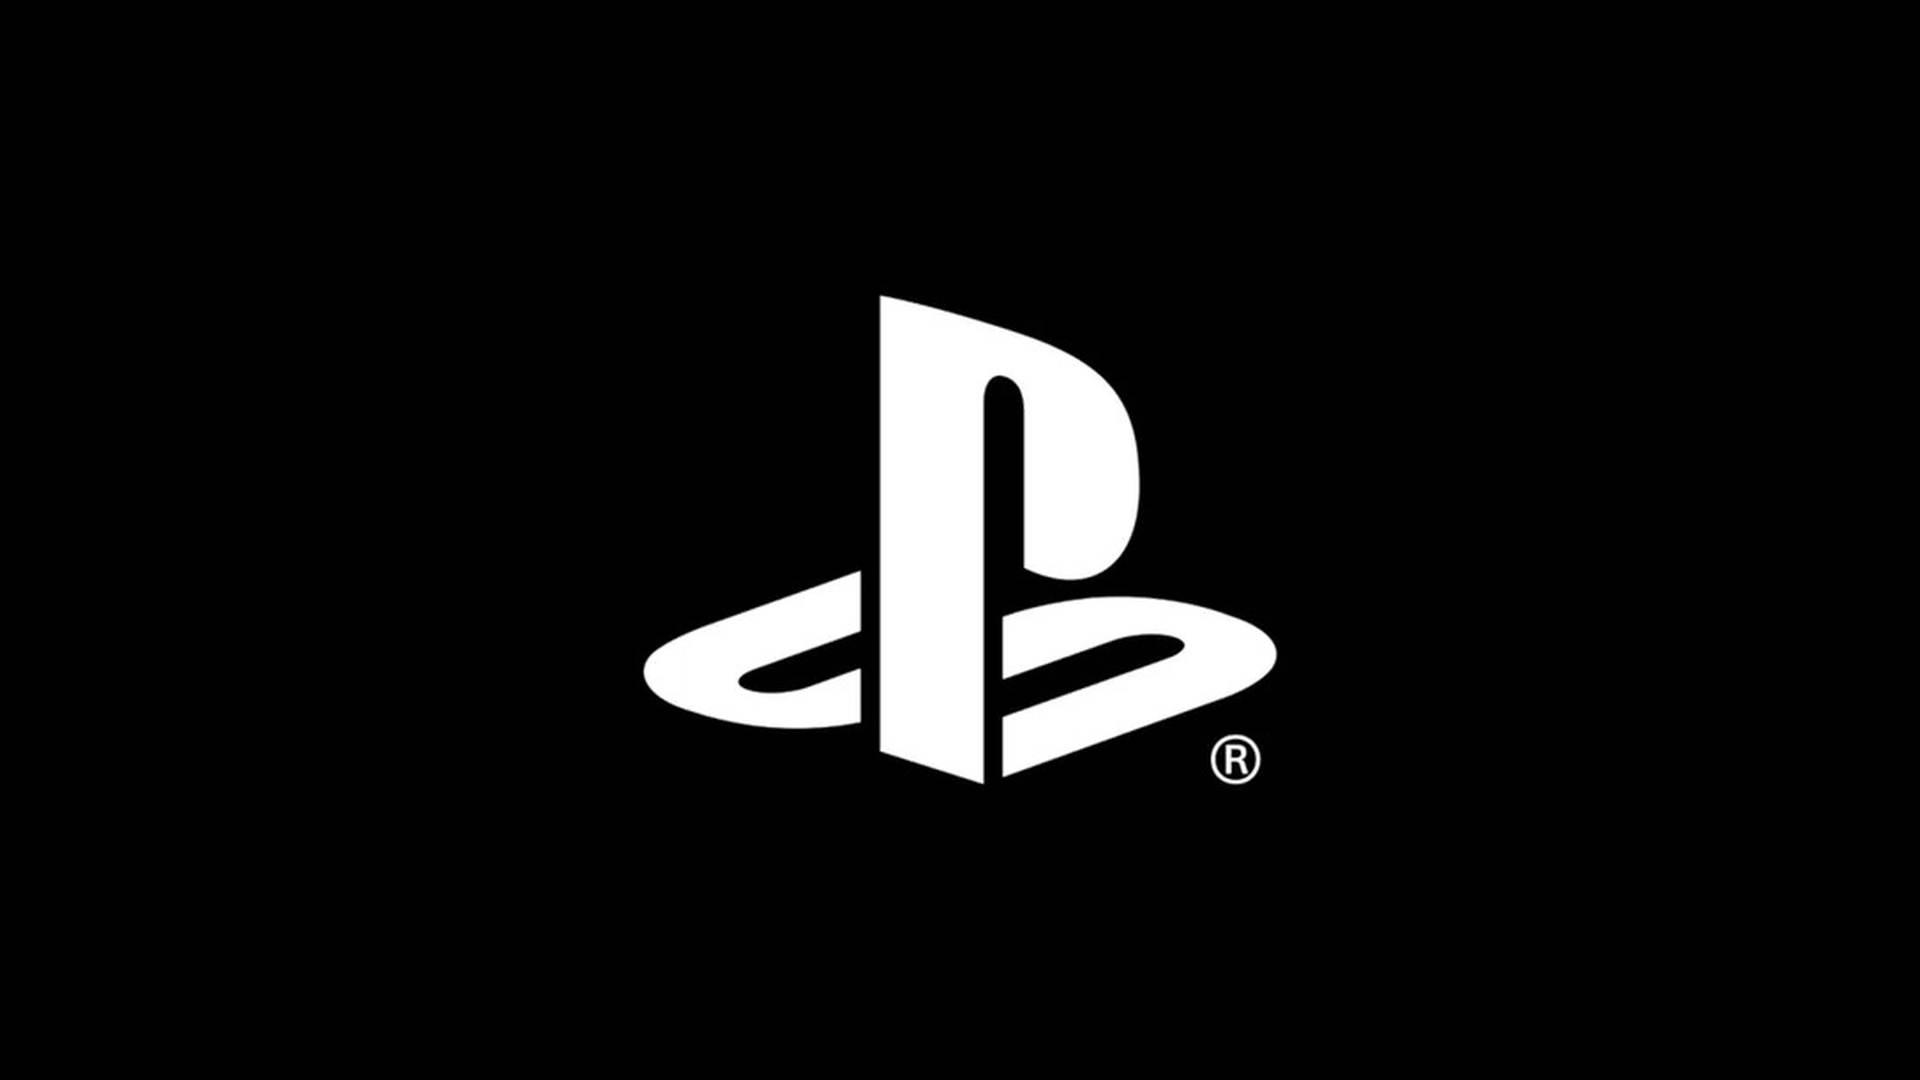 PlayStation reverses course on PS3, Vita store closure screenshot